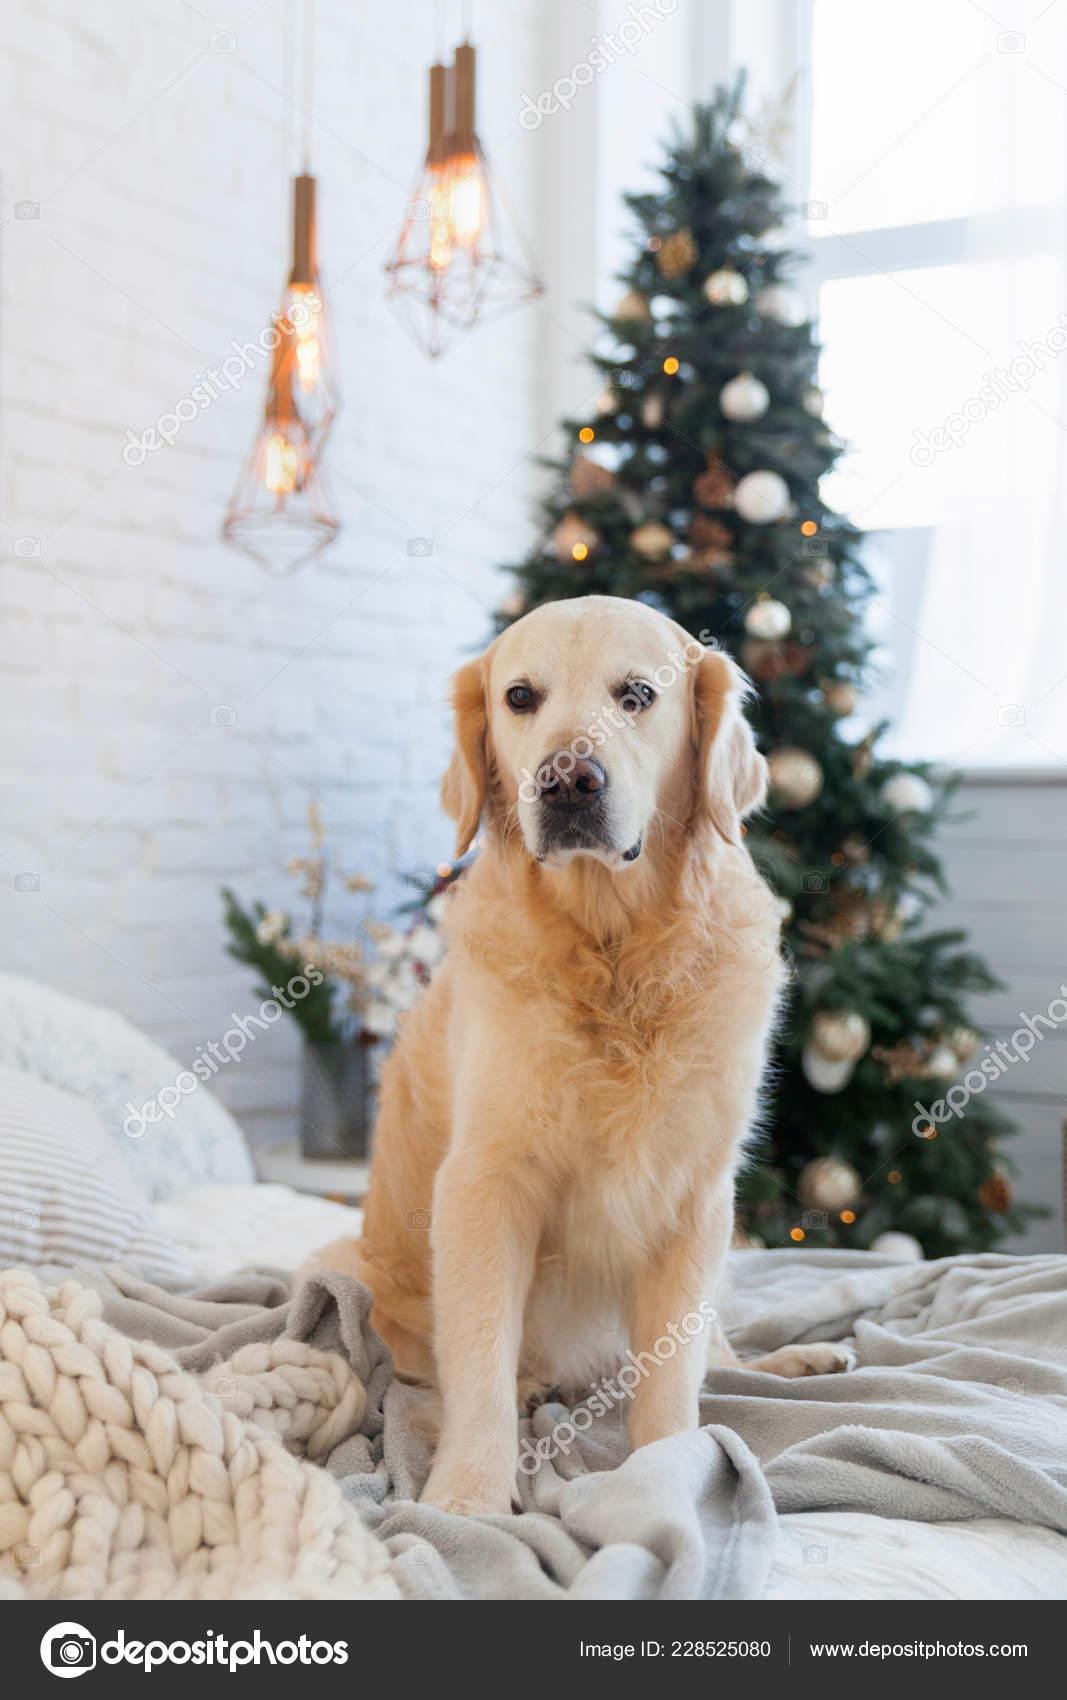 Golden Retriever Puppy Dog Pastel Light Knitted Coat Christmas Tree Stock Photo C Prystai 228525080